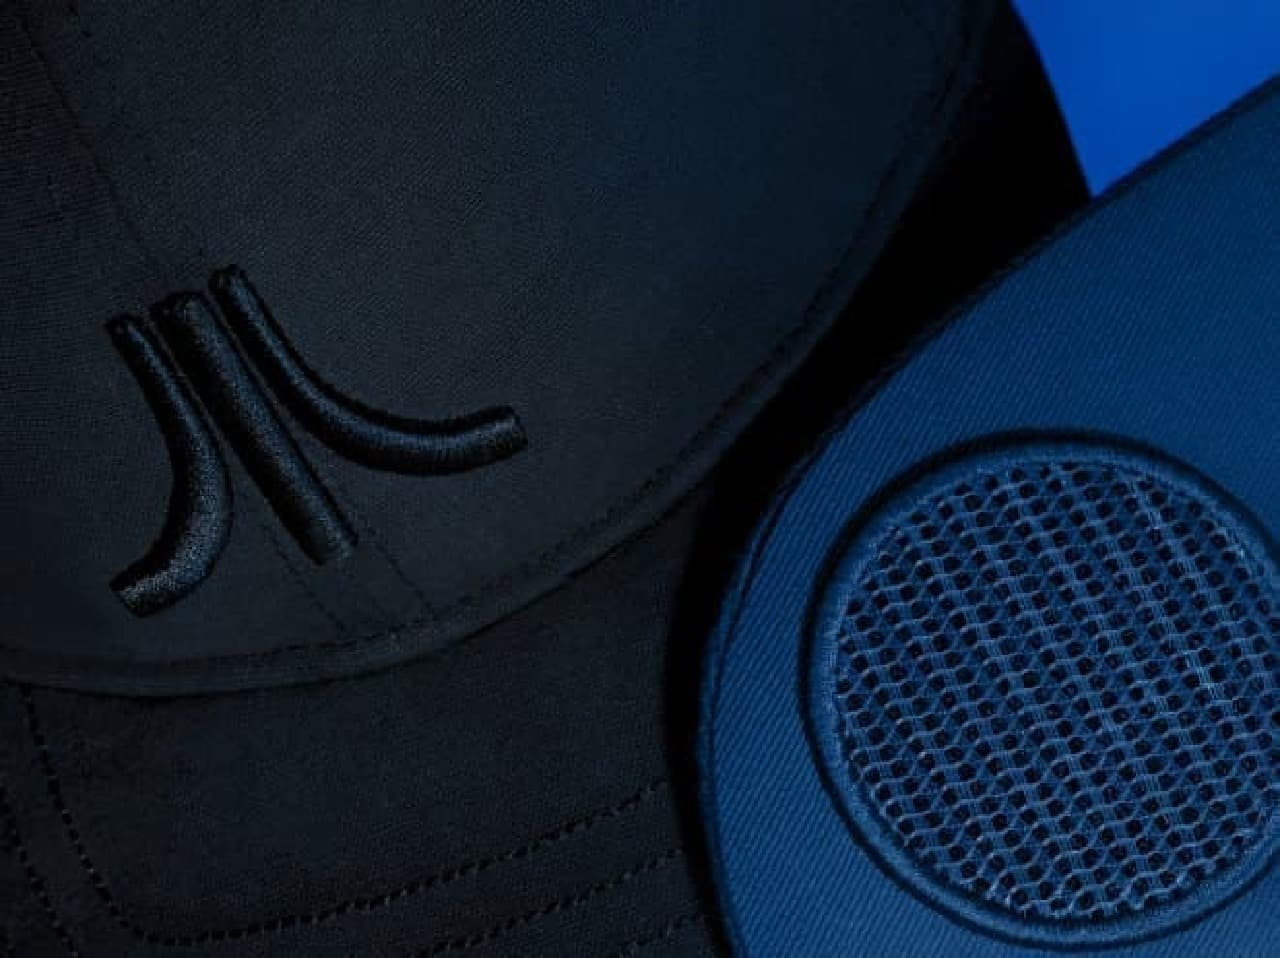 Attariのキャップ型スピーカー「Atari Speakerhat」